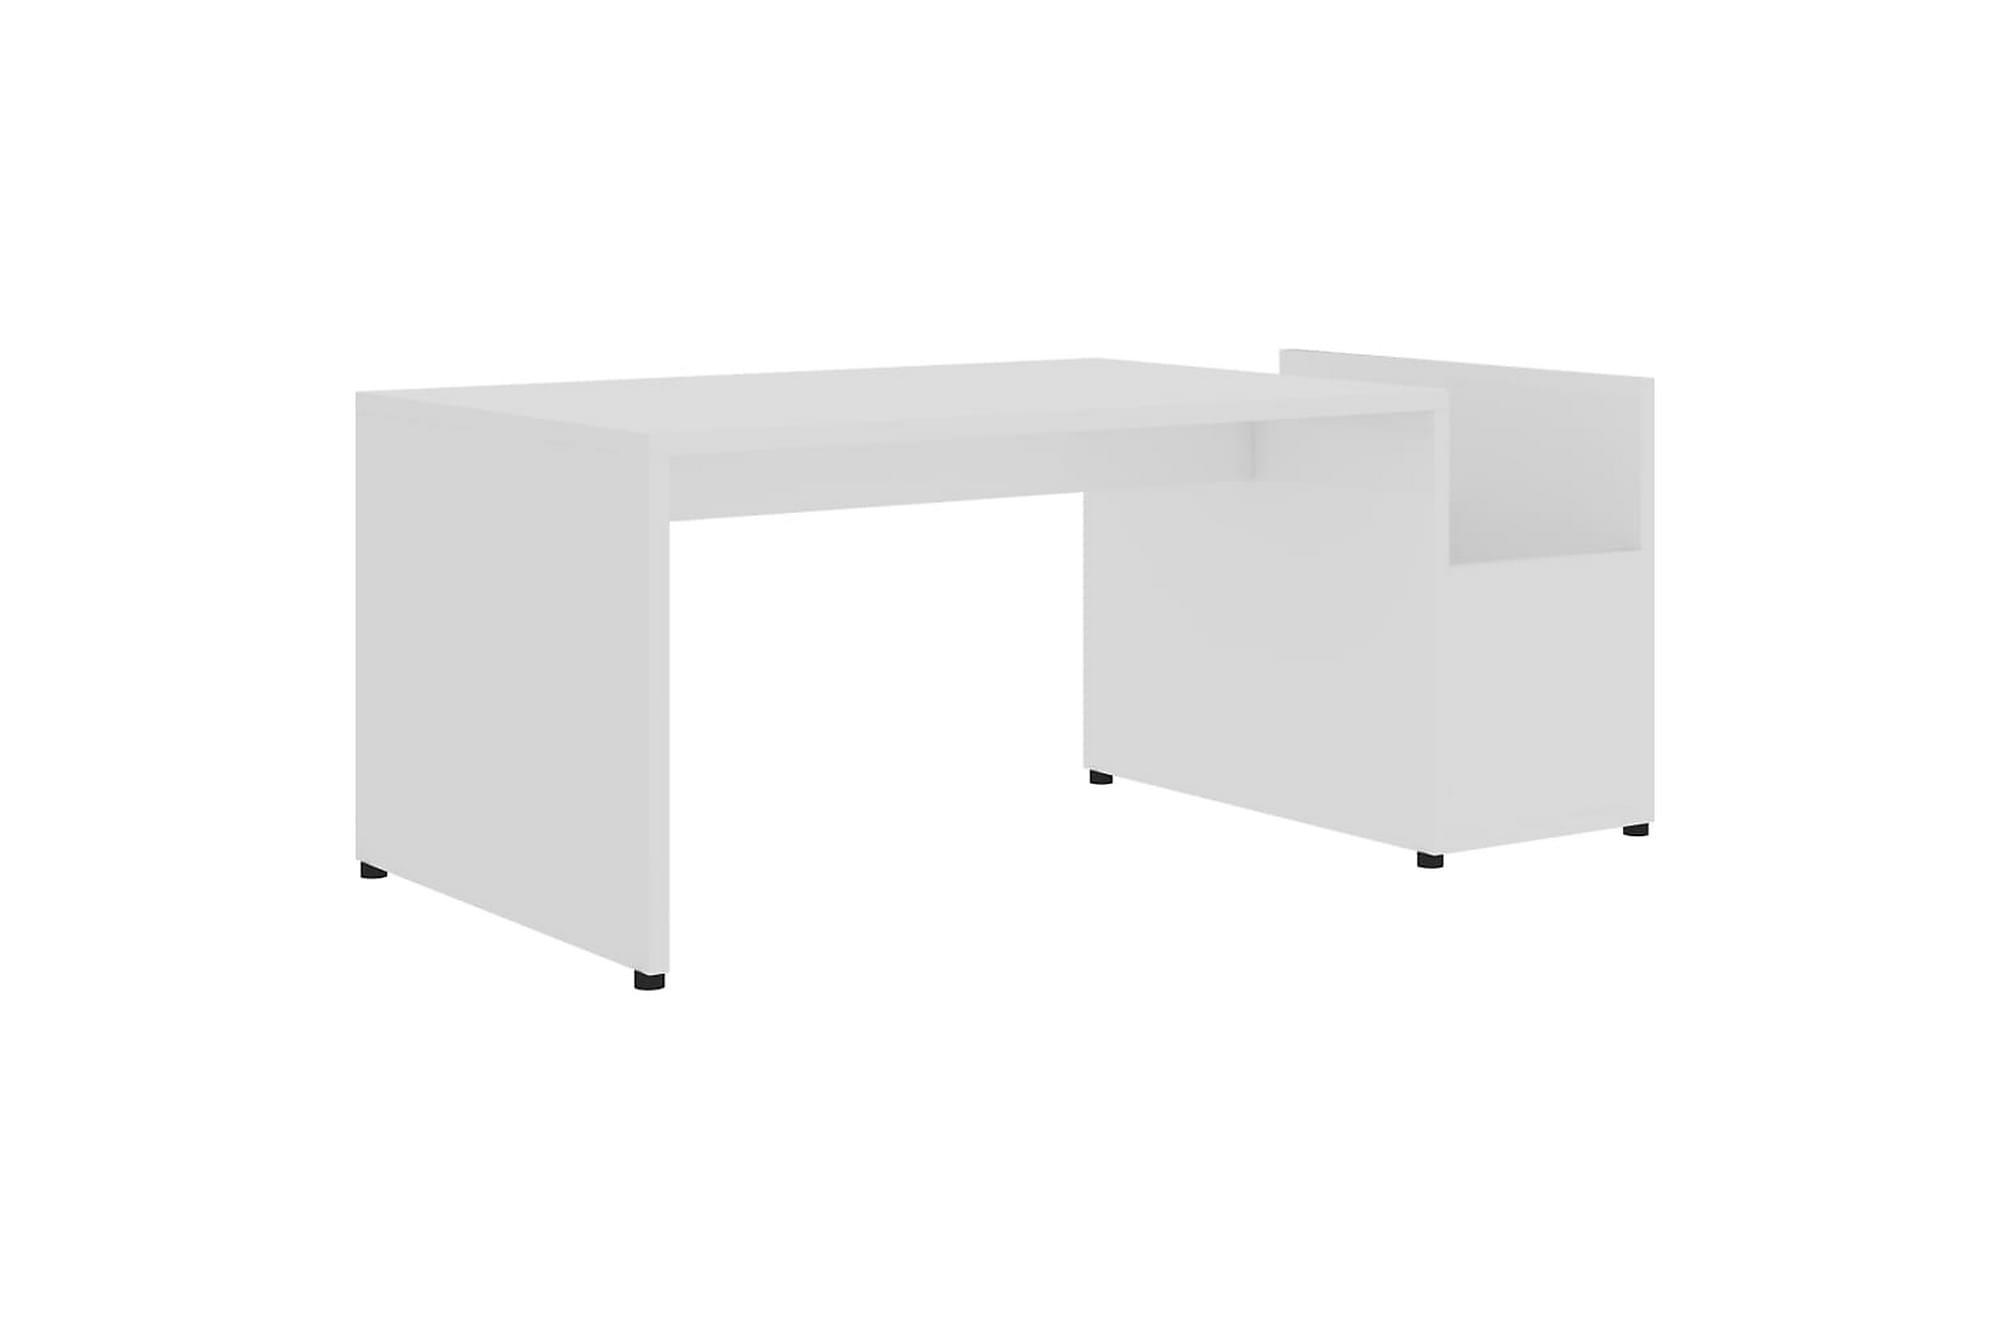 Soffbord vit högglans 90x45x35 cm spånskiva